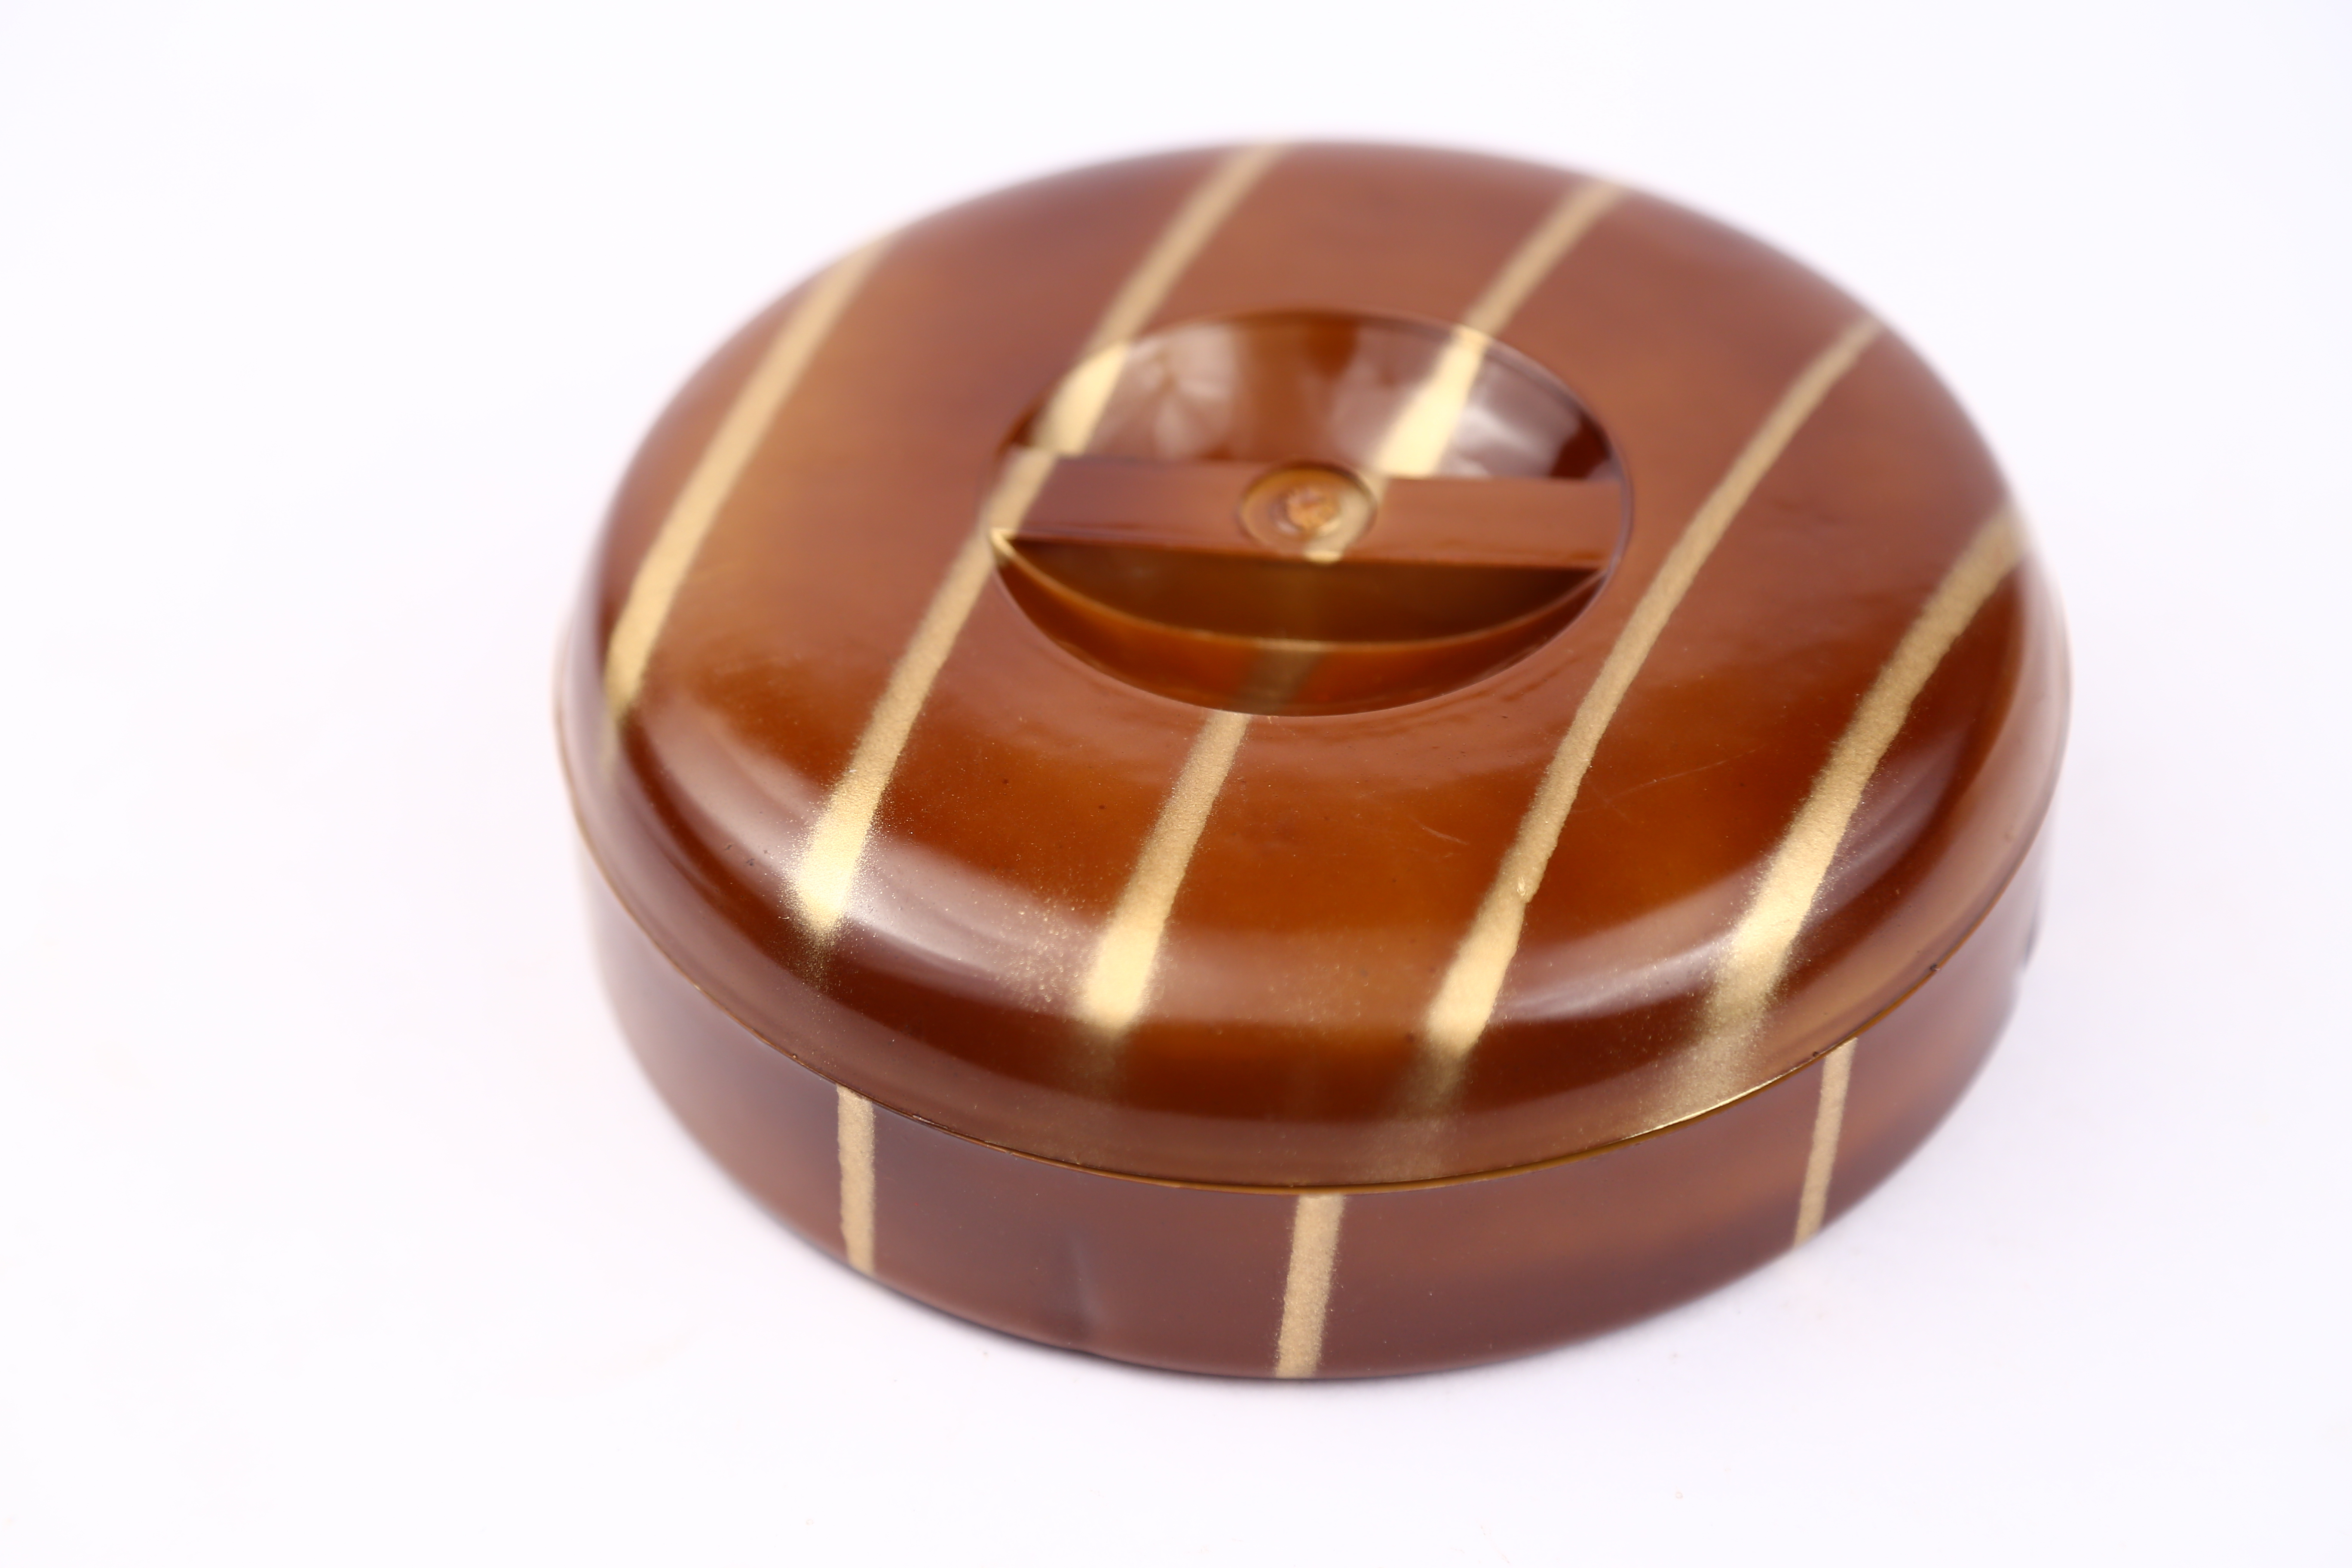 MINI COMMANDER-PLASTIC DRYFRUIT BOX